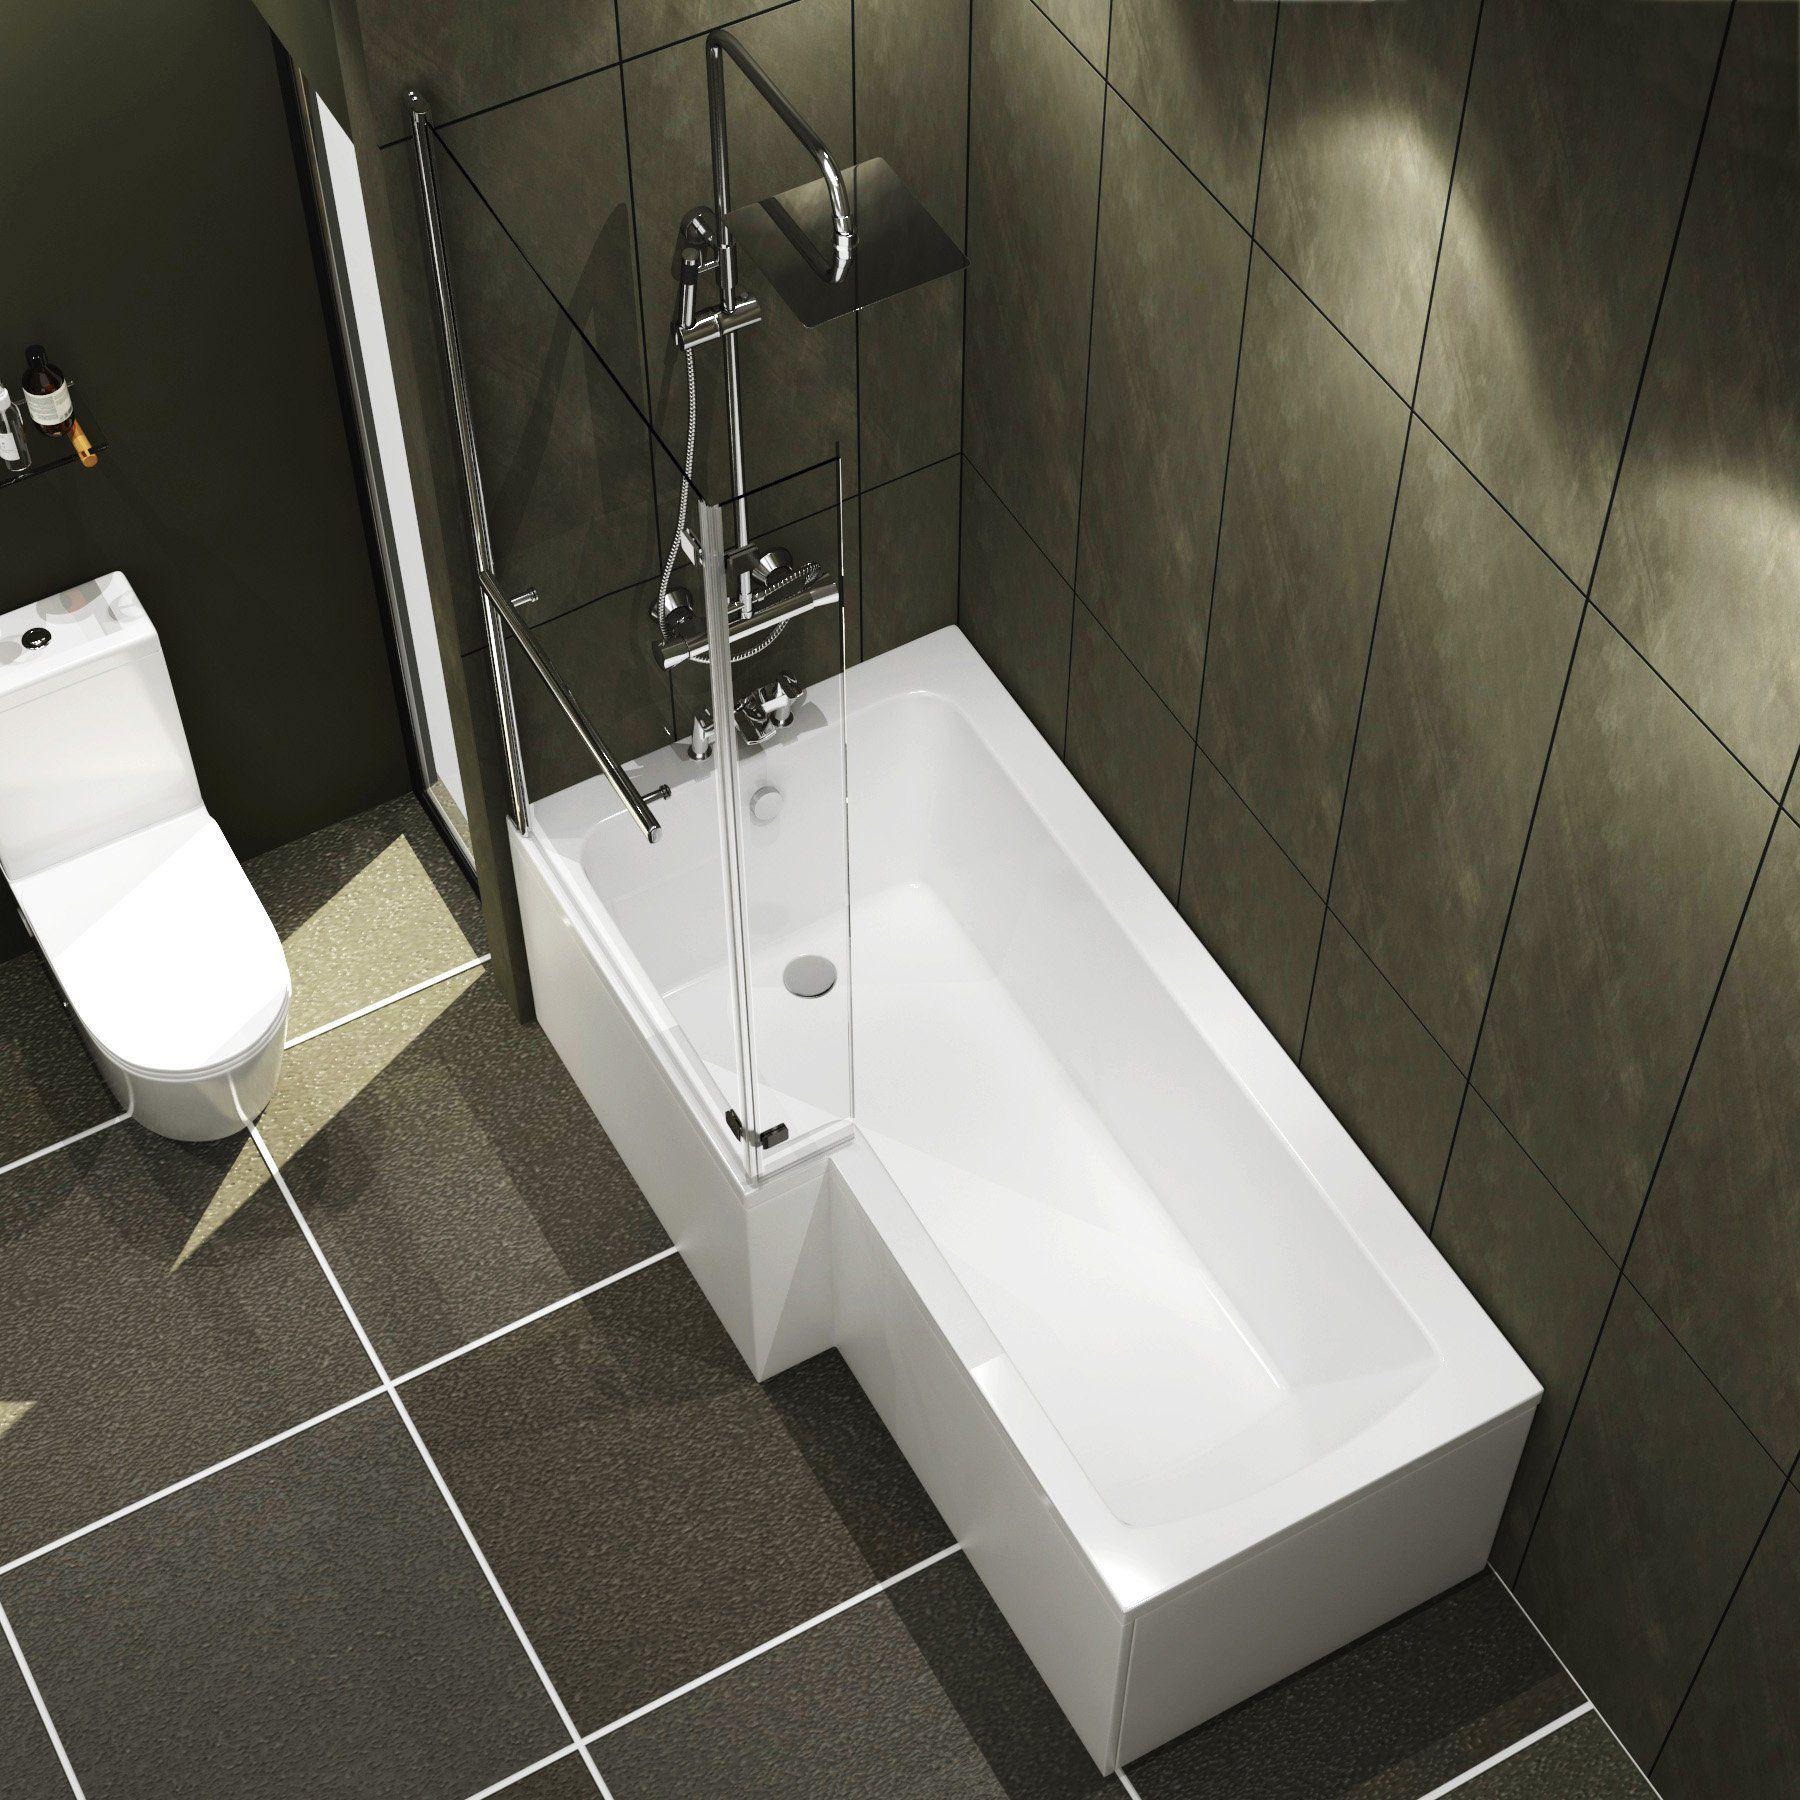 Modern Qubix 1500 x 850mm Left Hand L Shaped Shower Bath tub with Pivot Screen & Front Panel